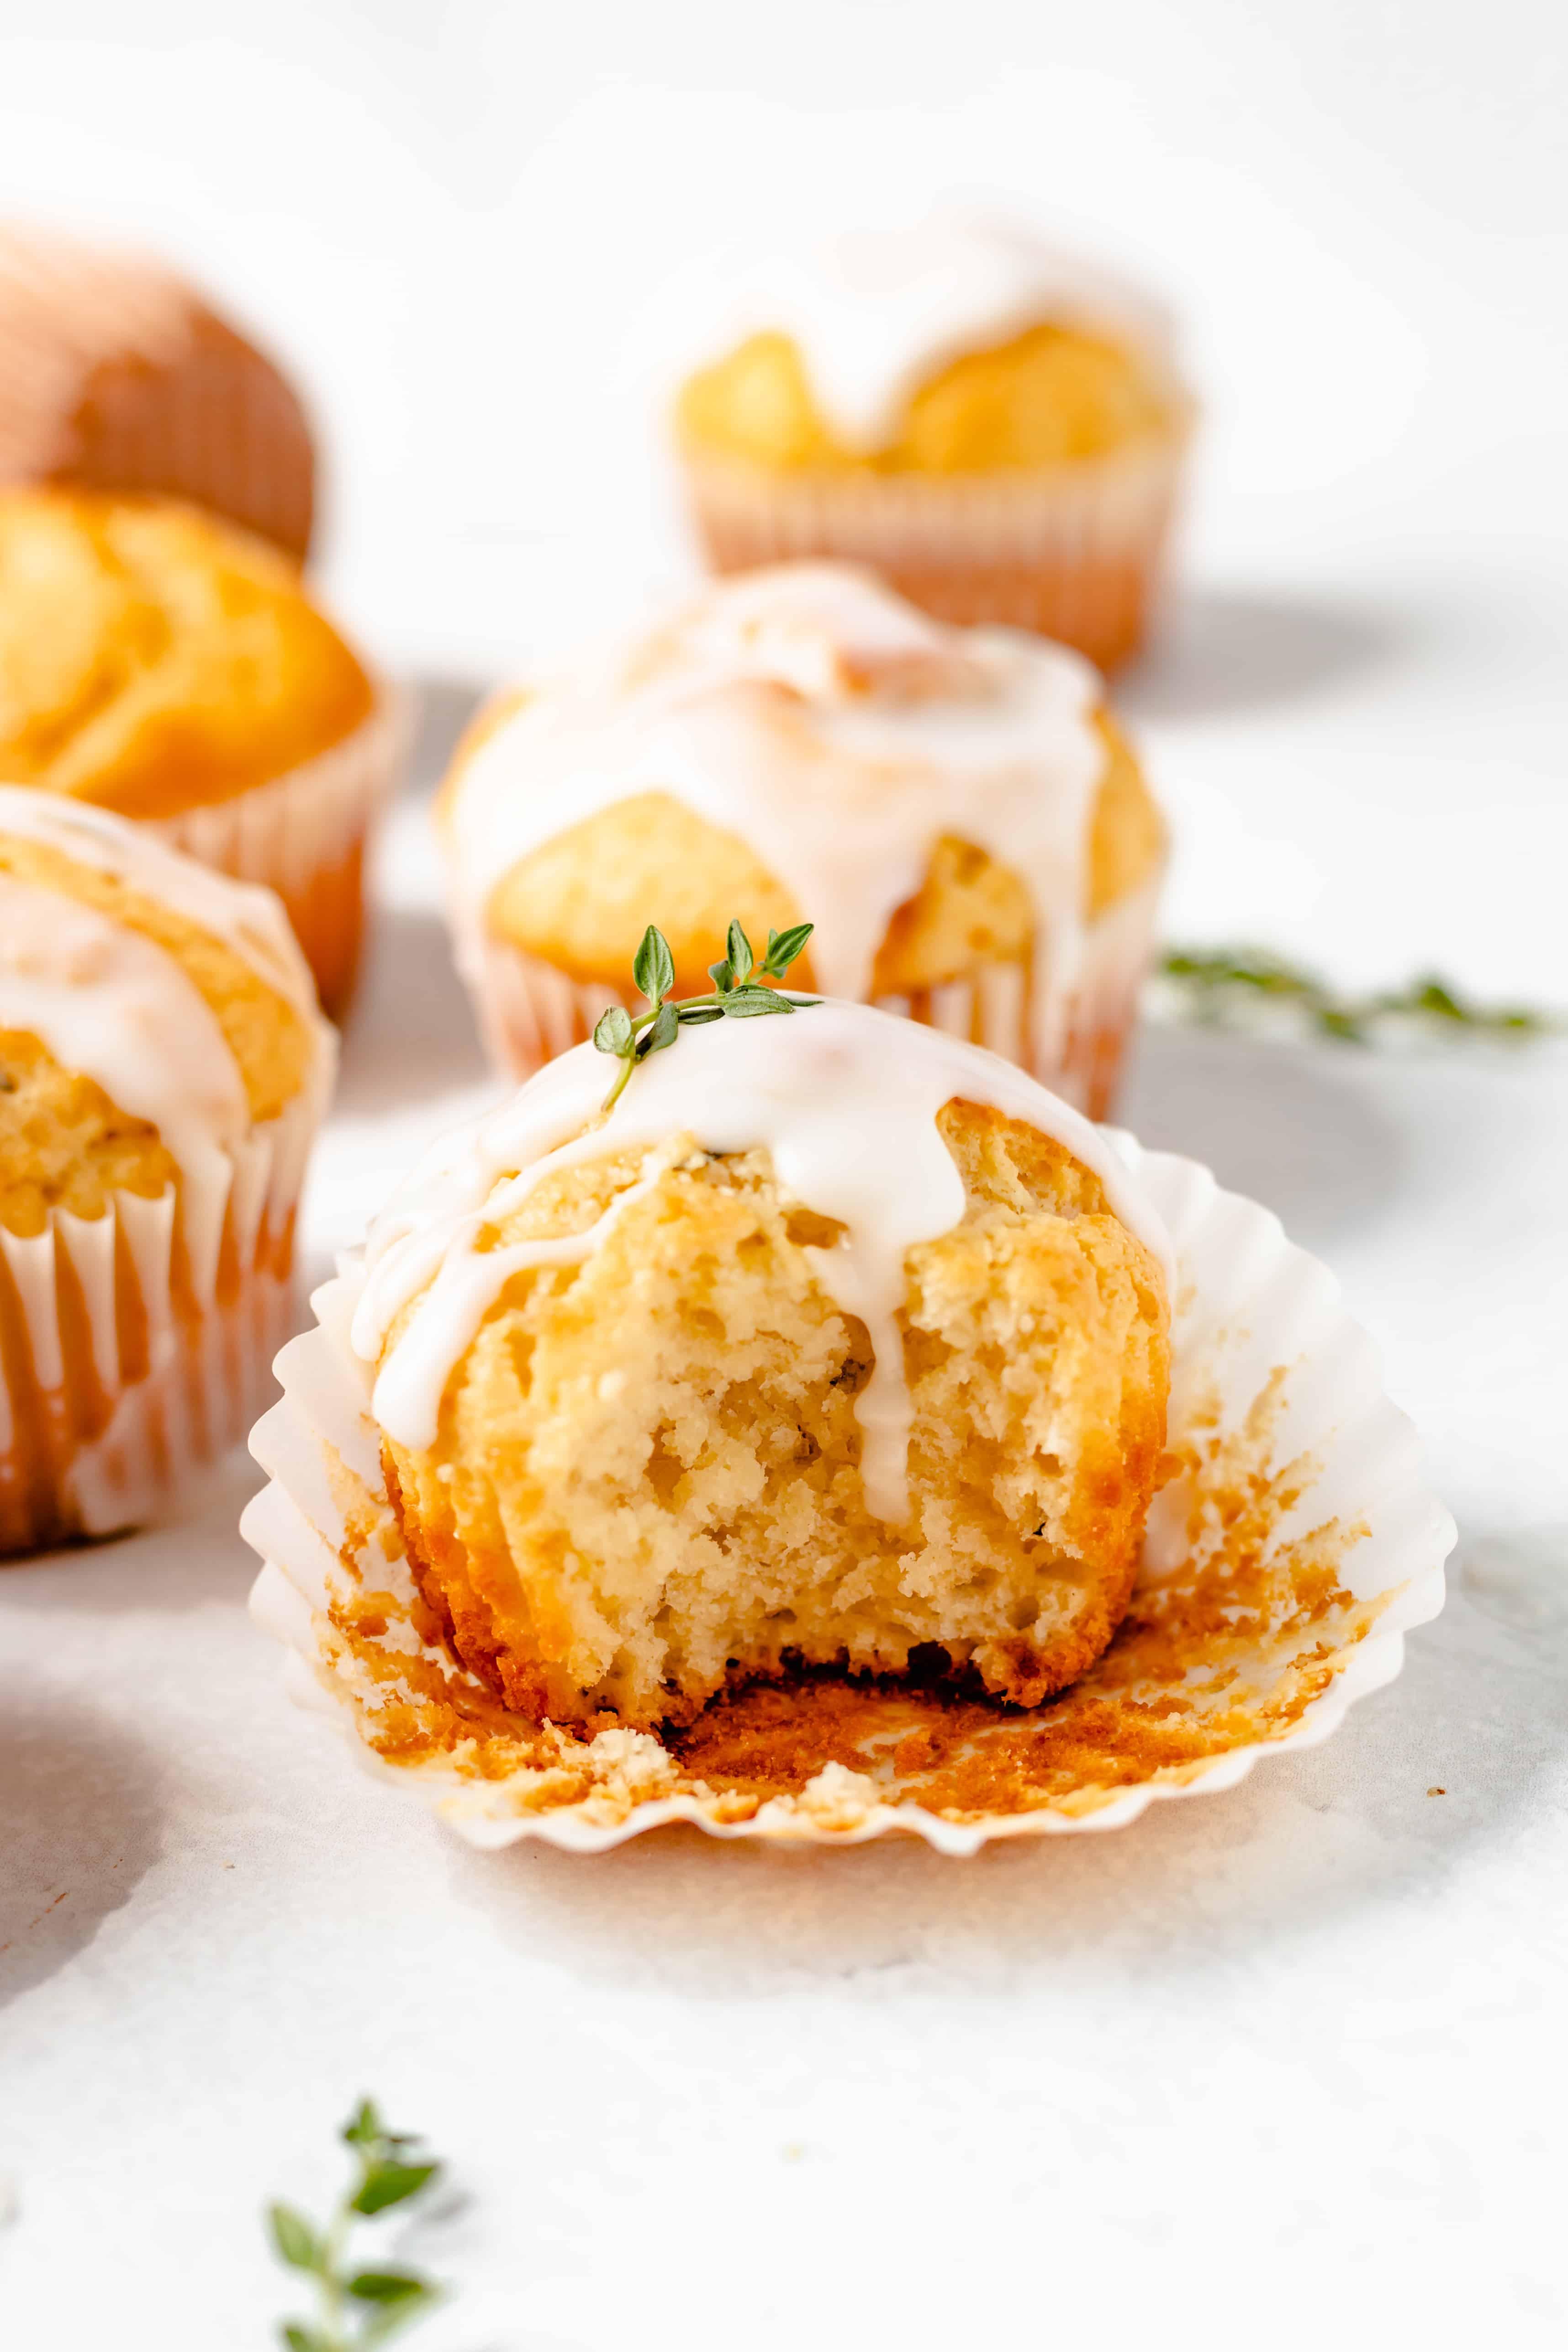 Lemon Thyme Muffins